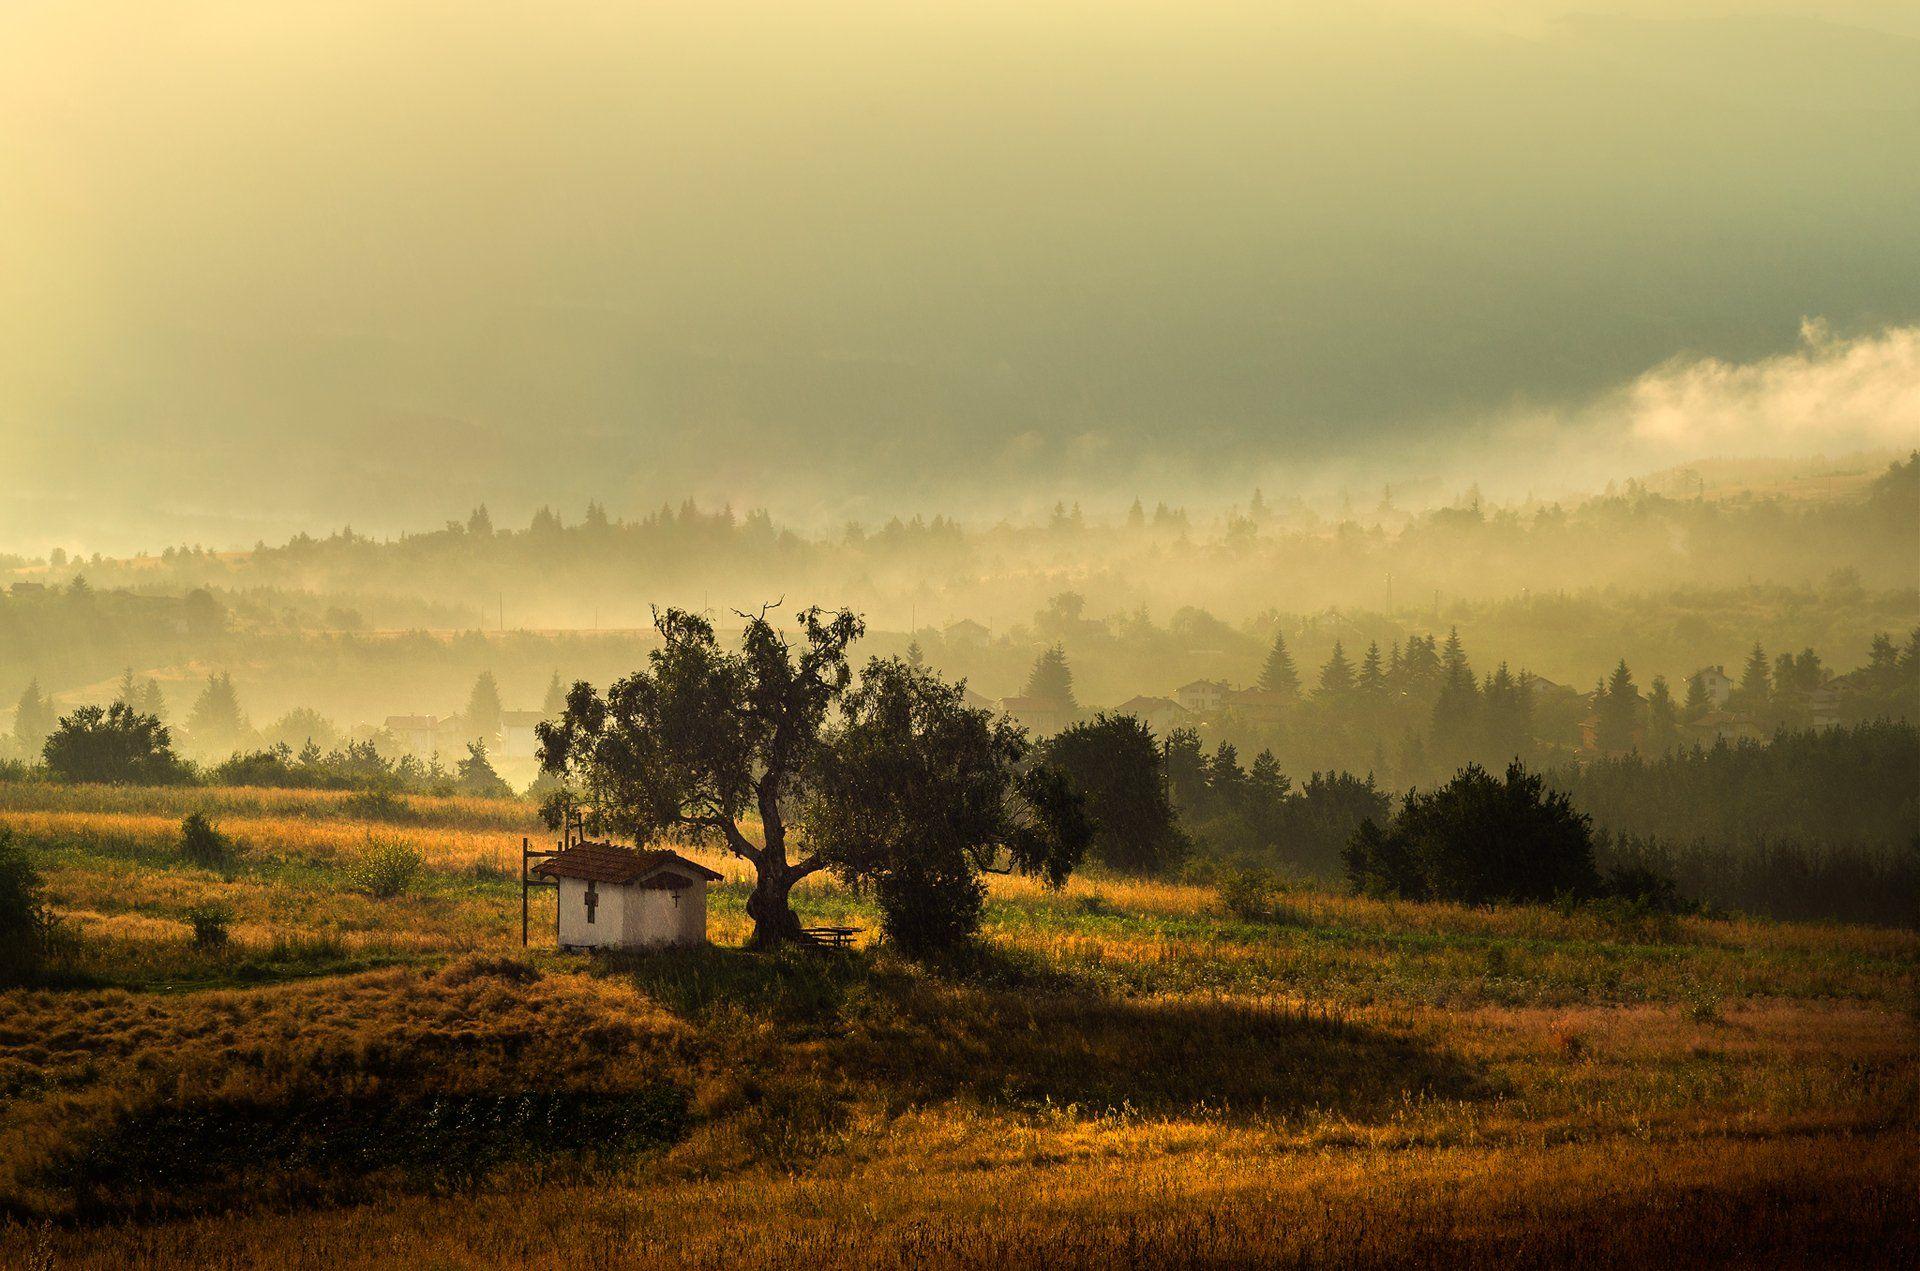 landscape nature sunset foggy scenery chapel mountain vitosha plana bulgaria закат пейзаж, Александър Александров